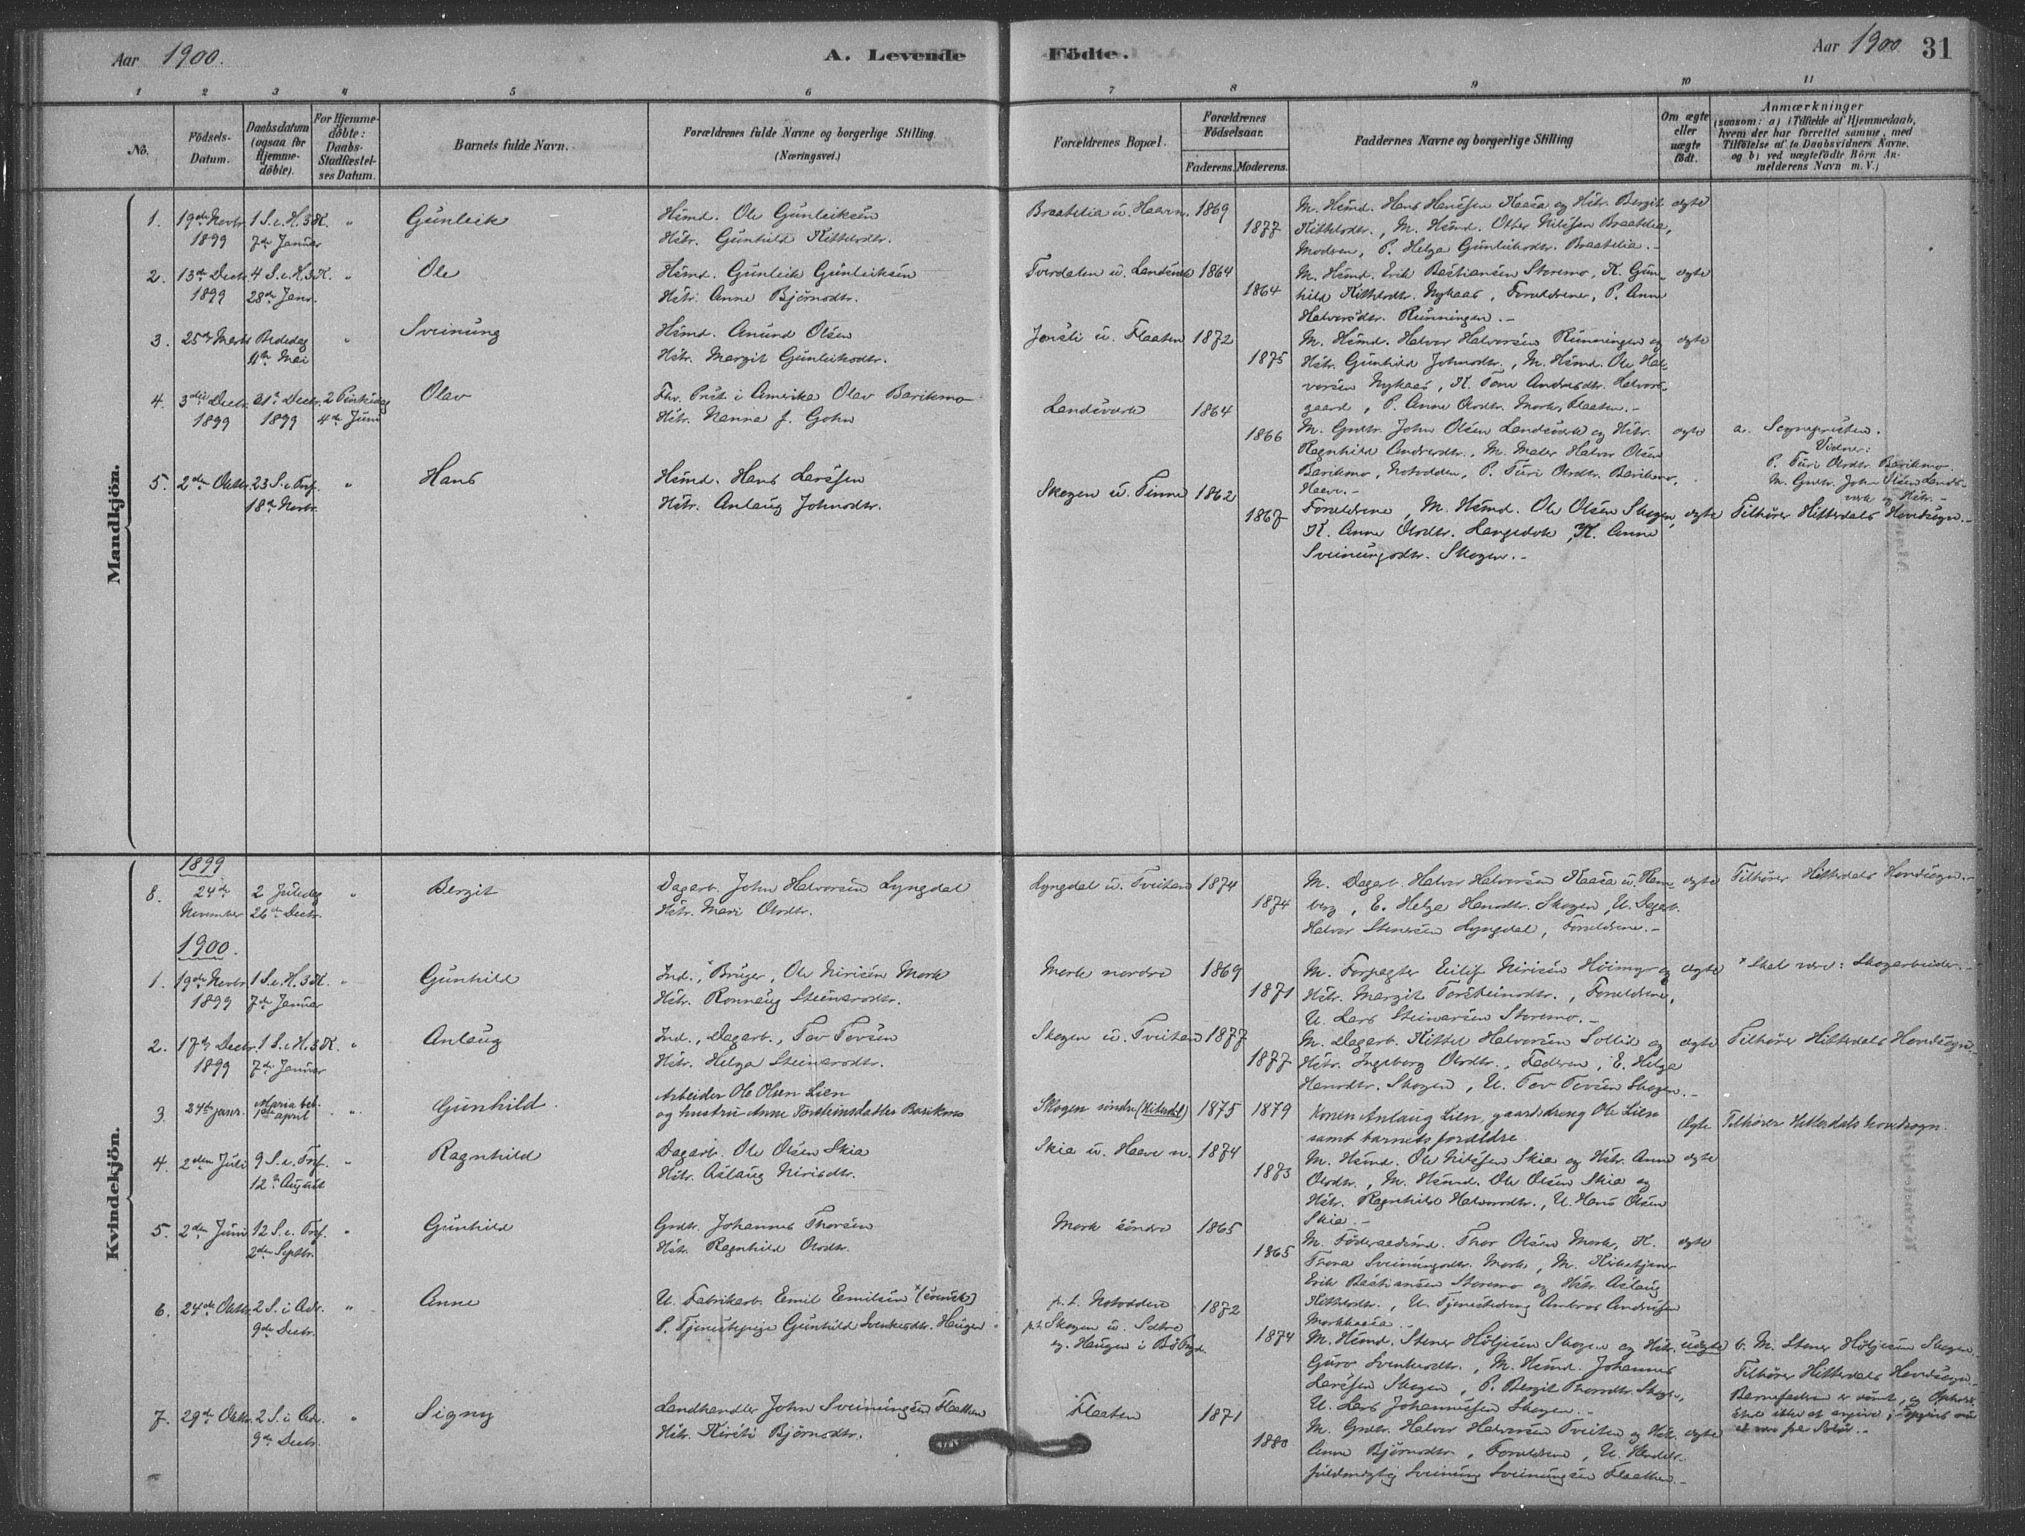 SAKO, Heddal kirkebøker, F/Fb/L0002: Ministerialbok nr. II 2, 1878-1913, s. 31